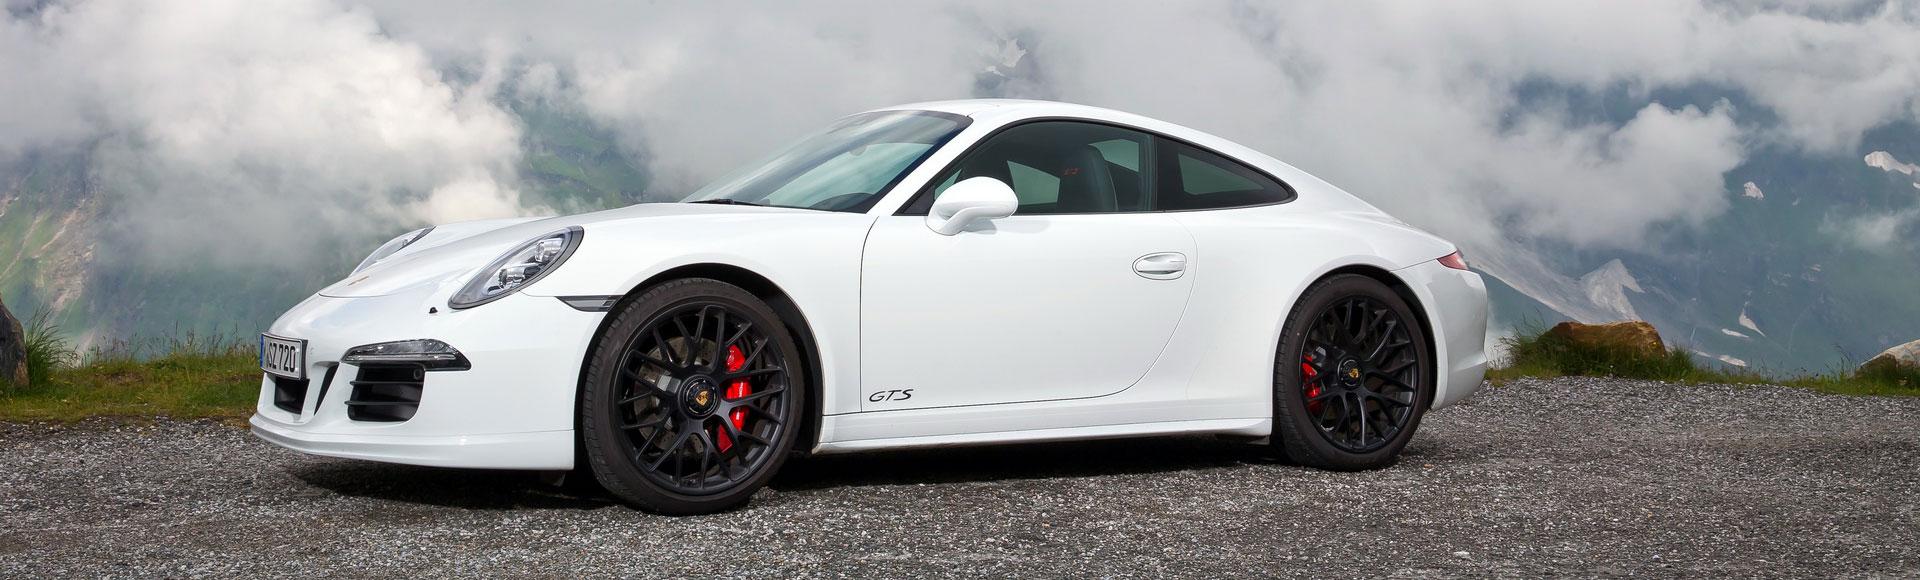 Porsche 991 GTS Coupe 2015 Herbst 041